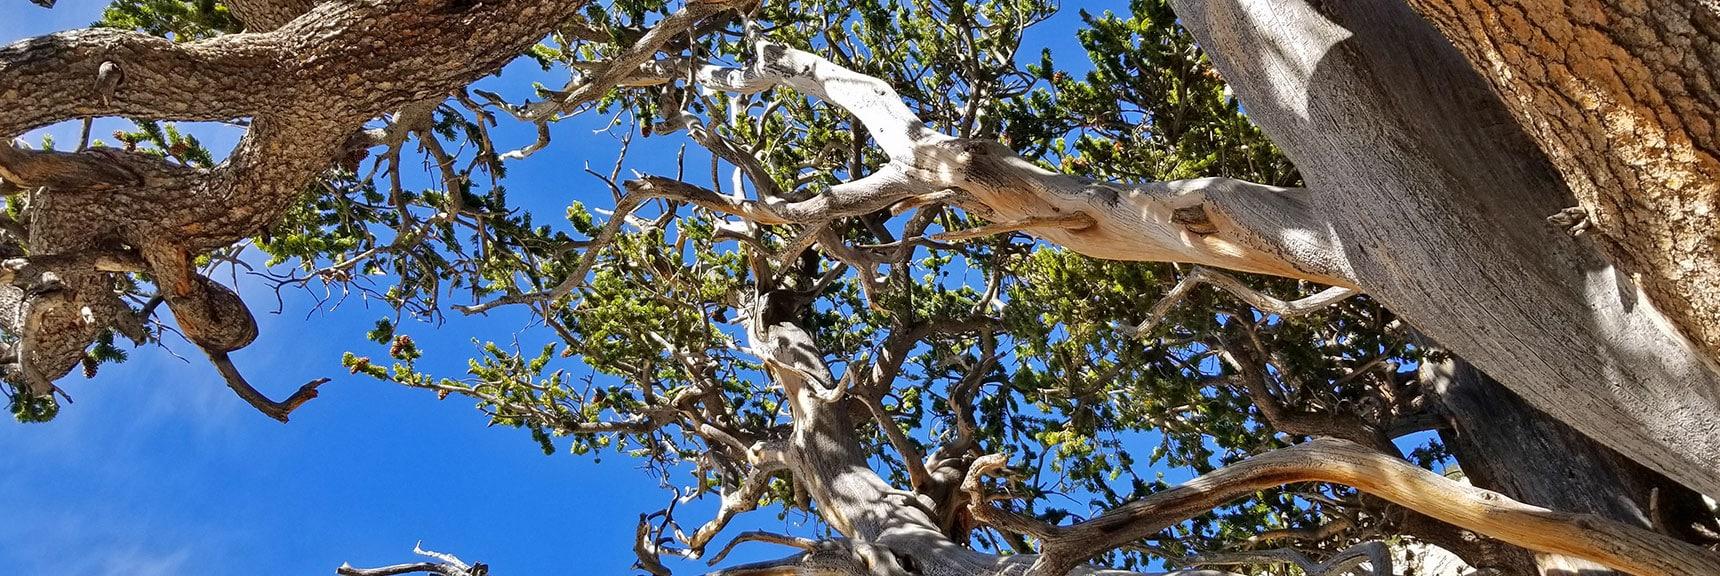 3000 year-old Raintree's Canopy | Mummy Mountain's Knees | Mt. Charleston Wilderness, Nevada 012